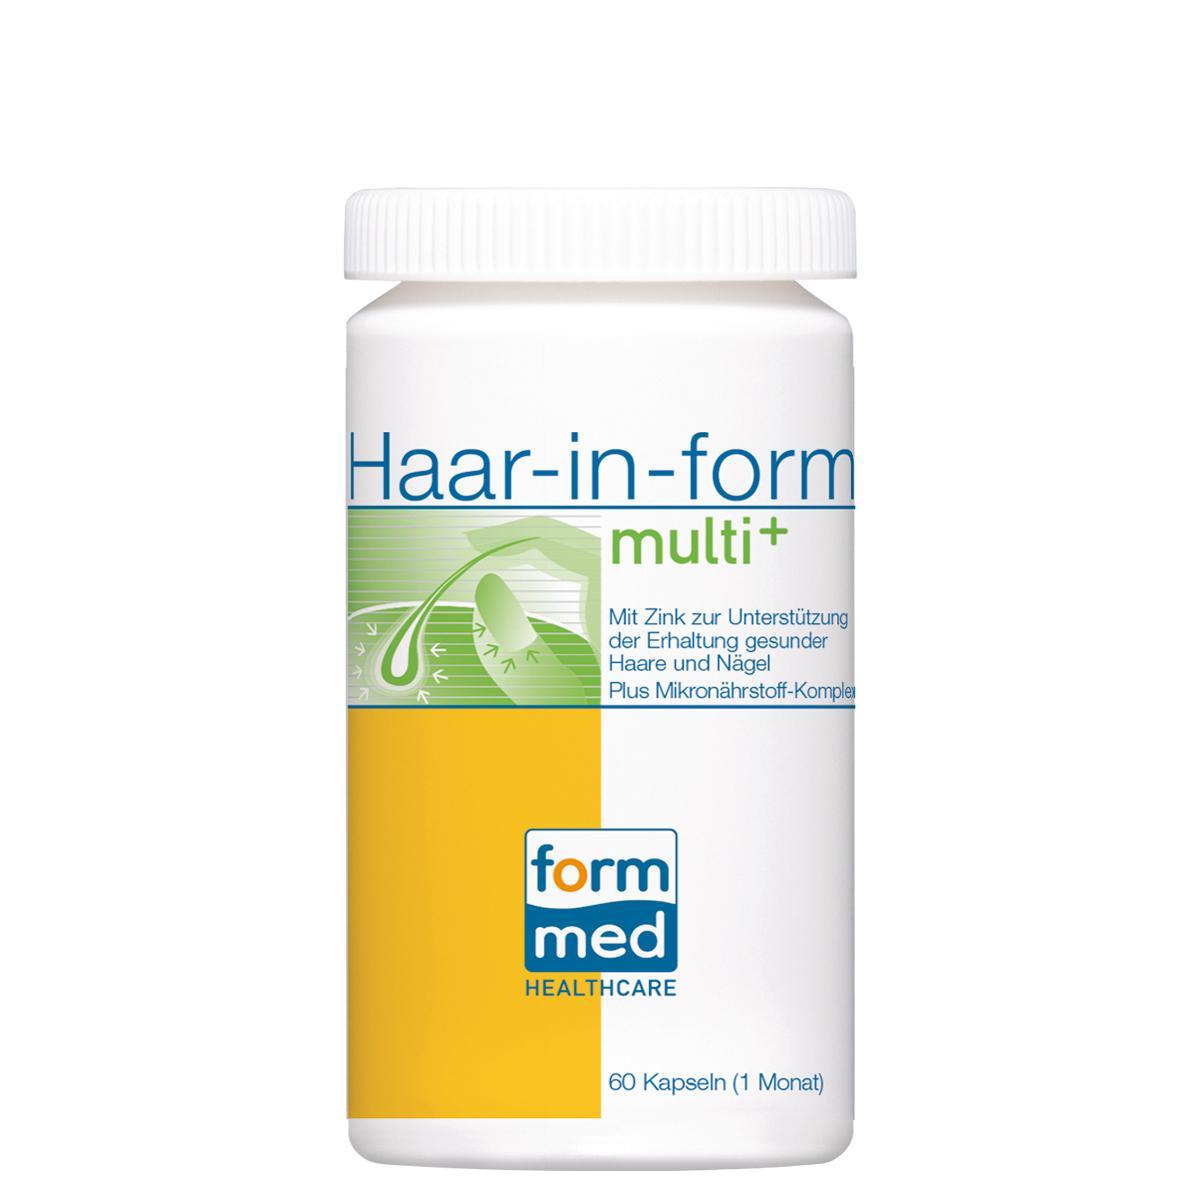 Haar-in-form® multi+